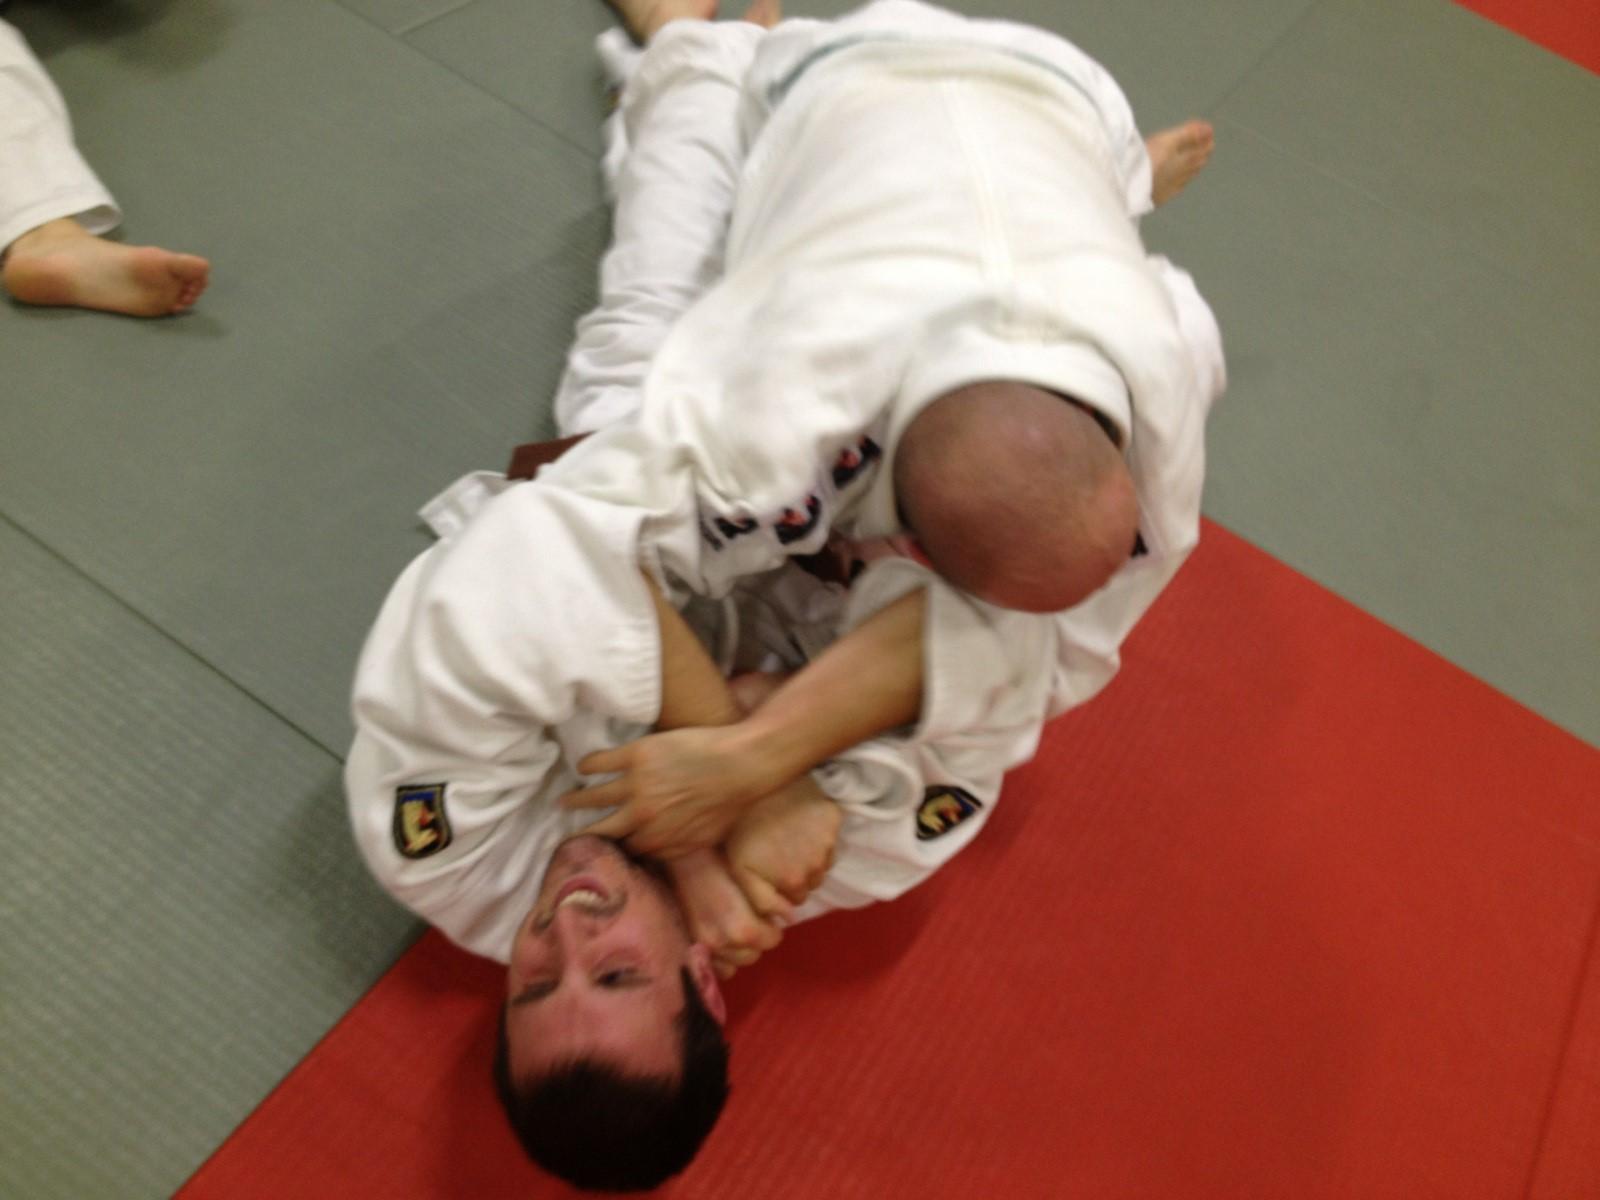 jujitsu-efjjsd-novembre-2013 3